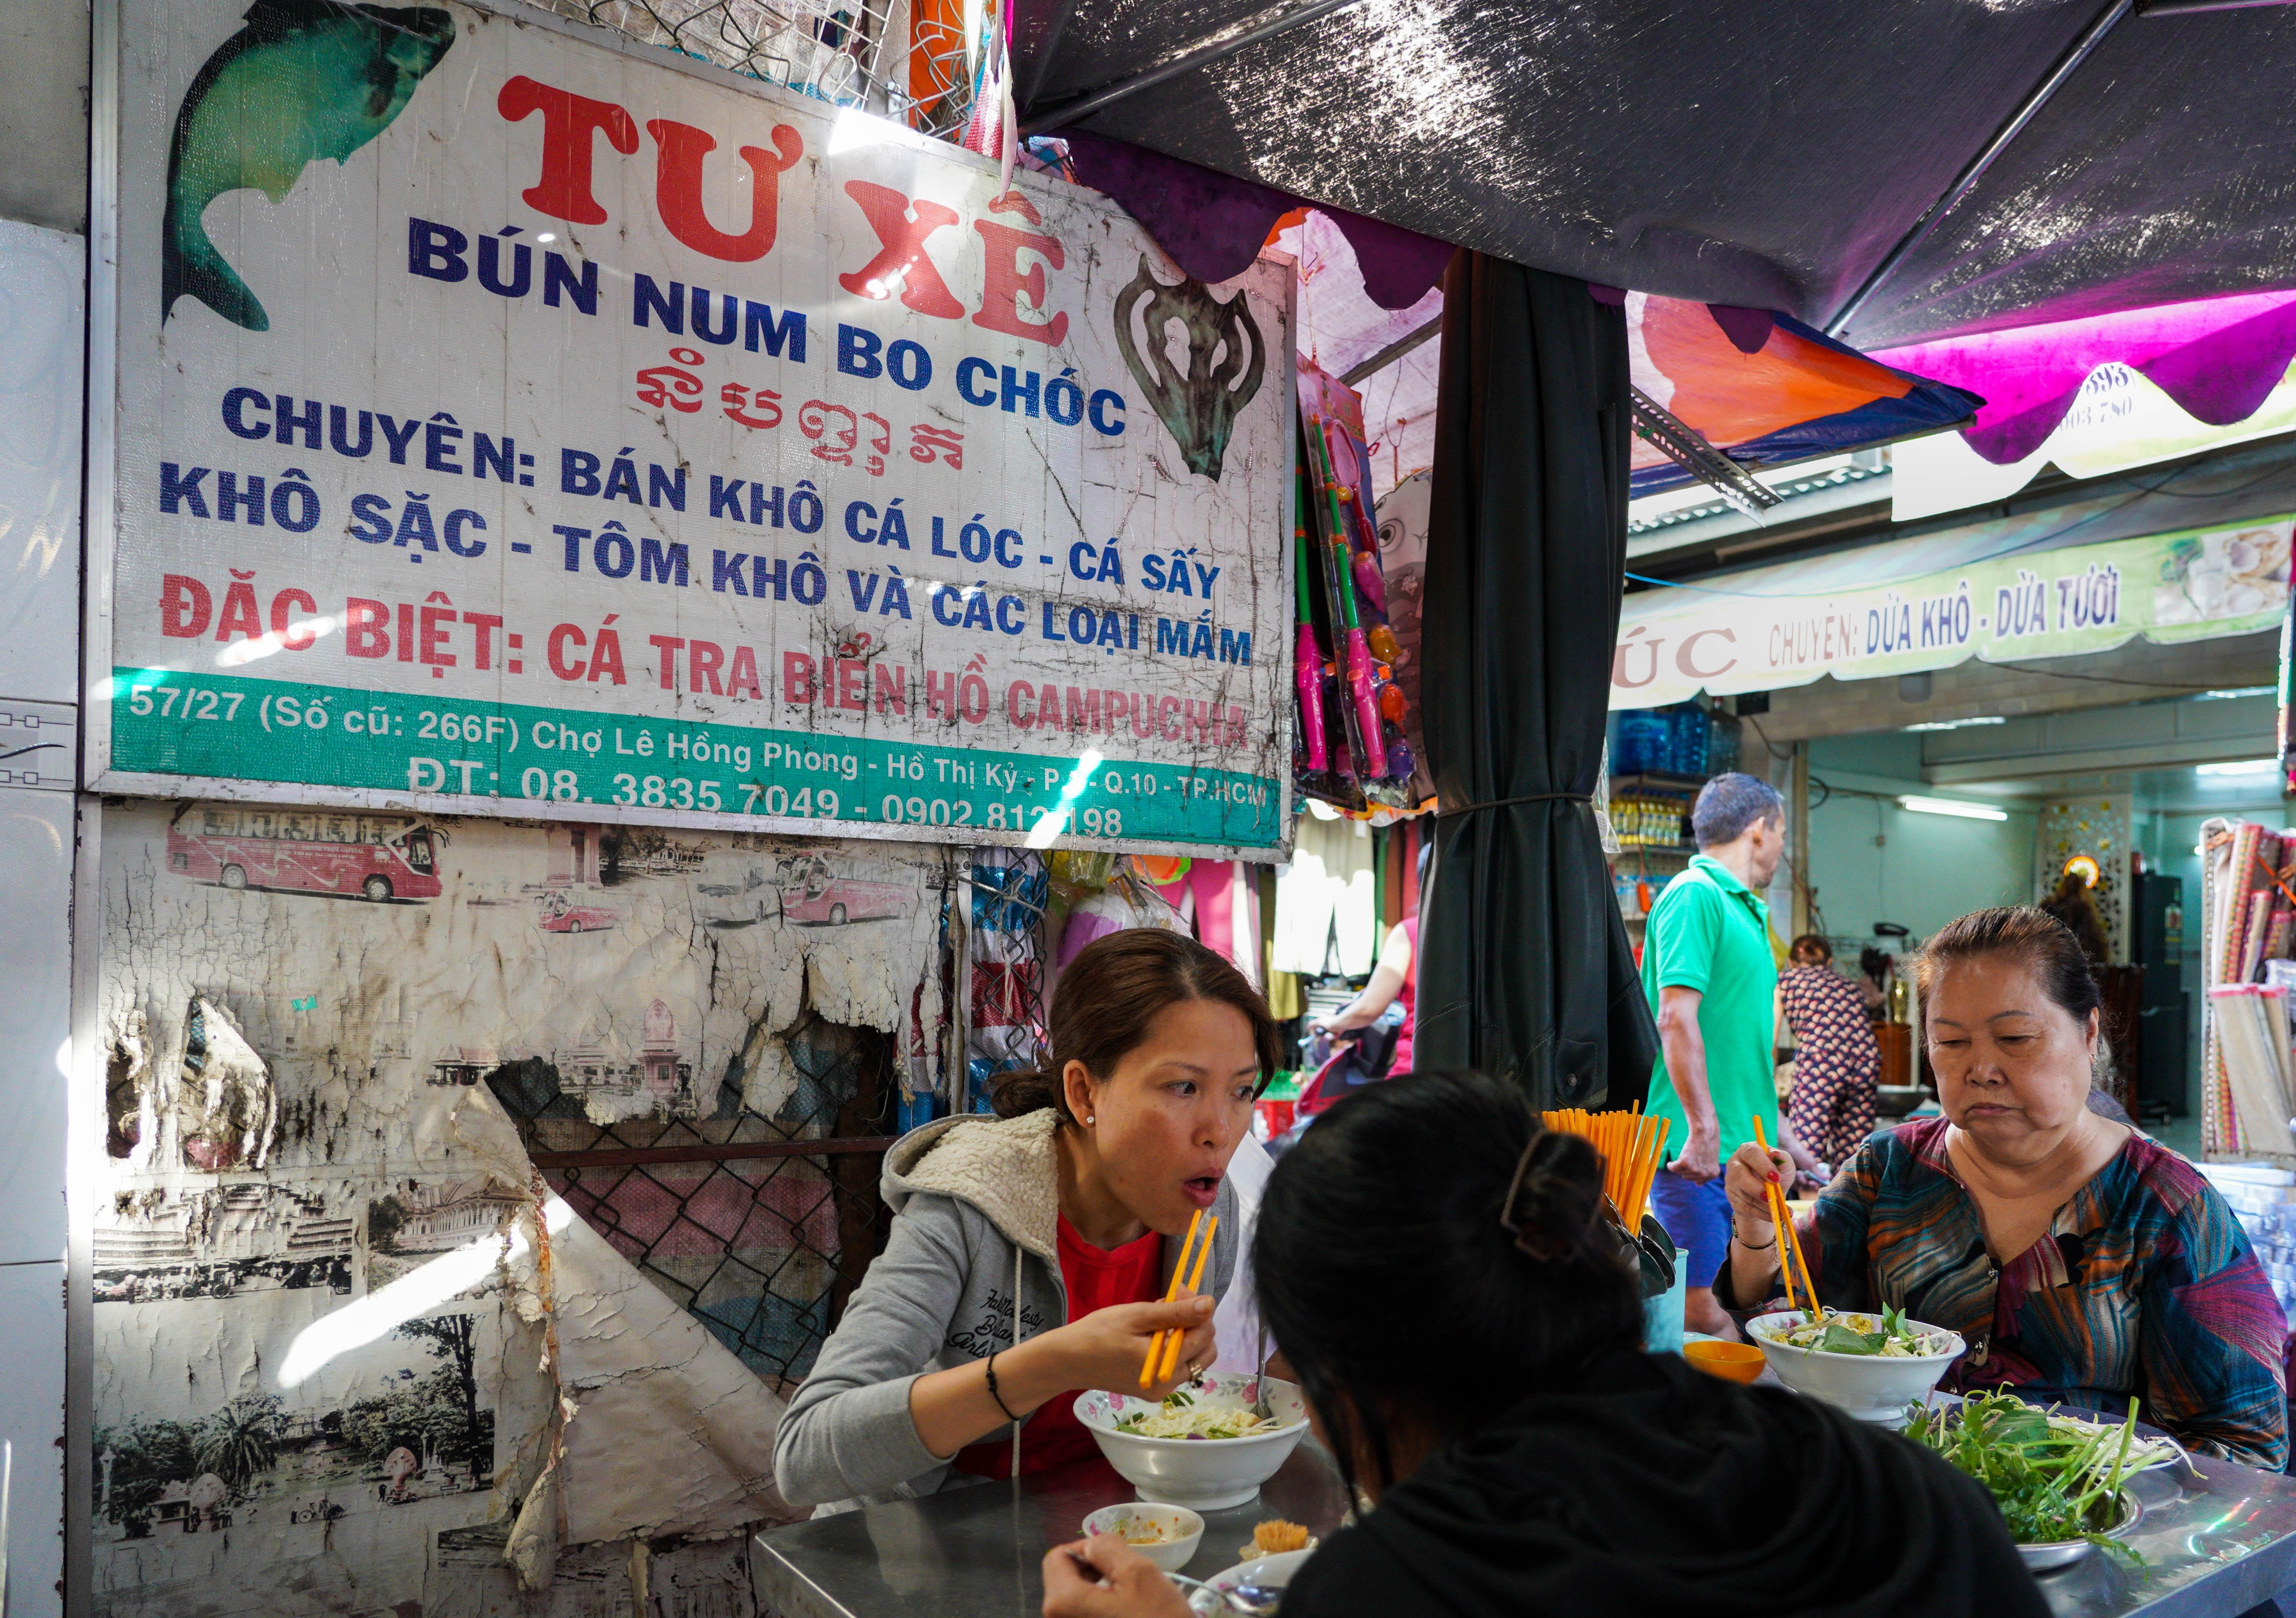 Quan bun ca Campuchia gan nua the ky giua long Sai Gon hinh anh 1 TCH04860_14.jpg